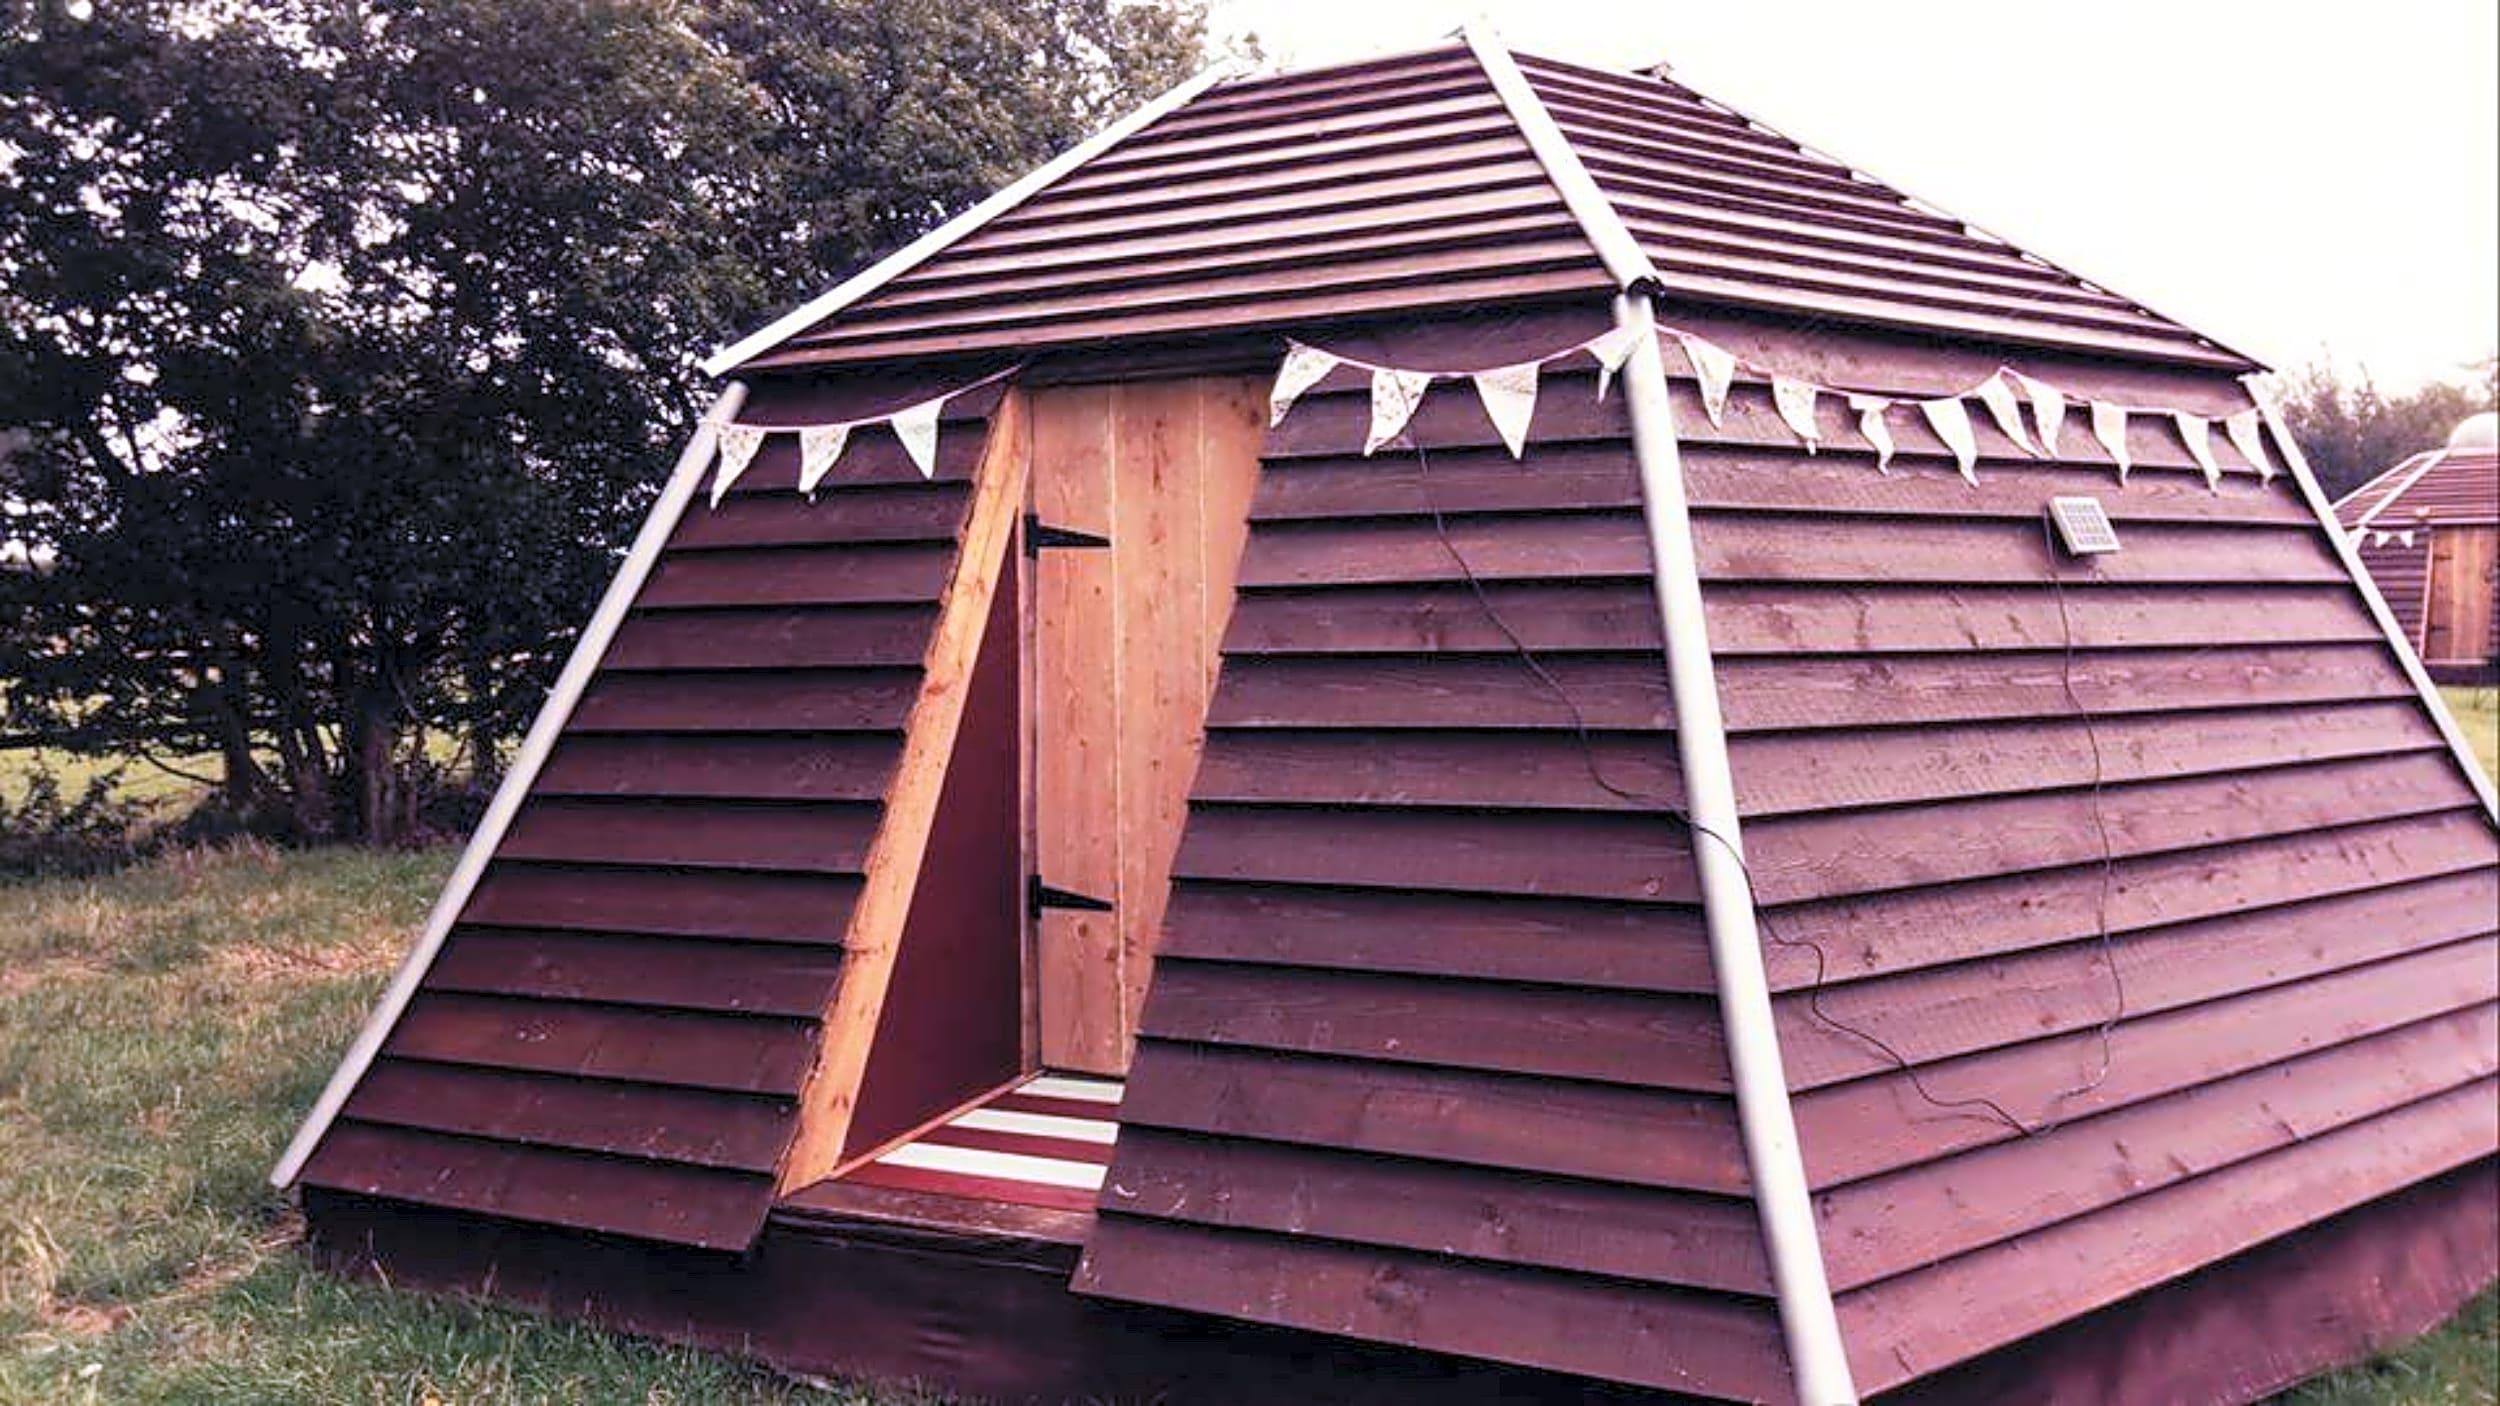 Honey Pod Farm, Upton Upon Severn, England